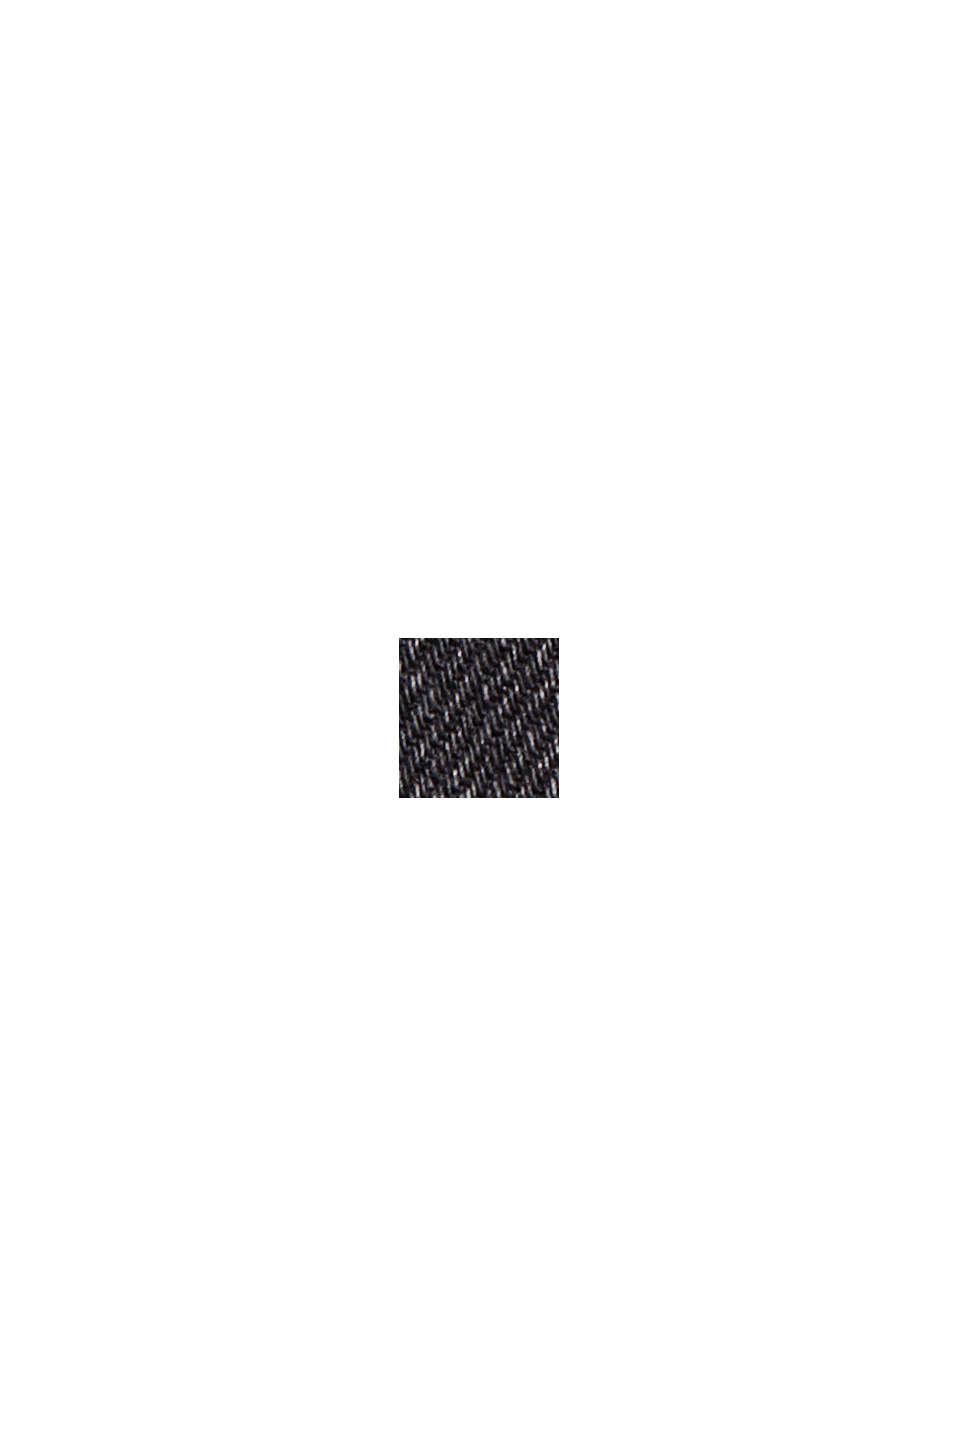 Pants denim Paperbag Fit High Rise, BLACK DARK WASHED, swatch